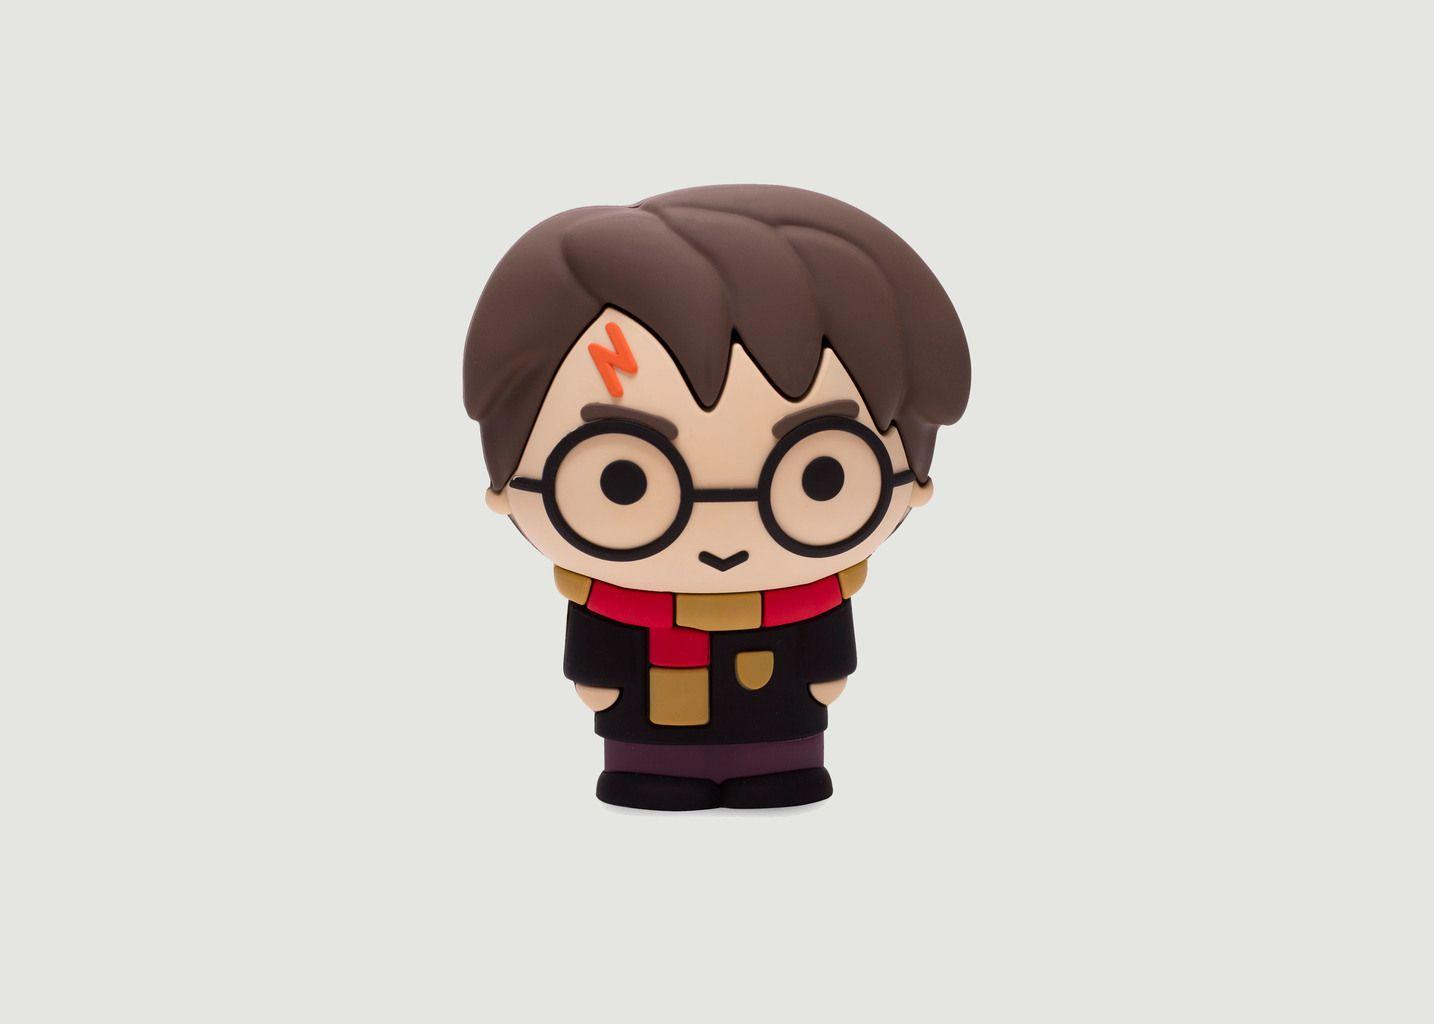 Harry Potter PowerSquad Powerbank - Thumbs Up